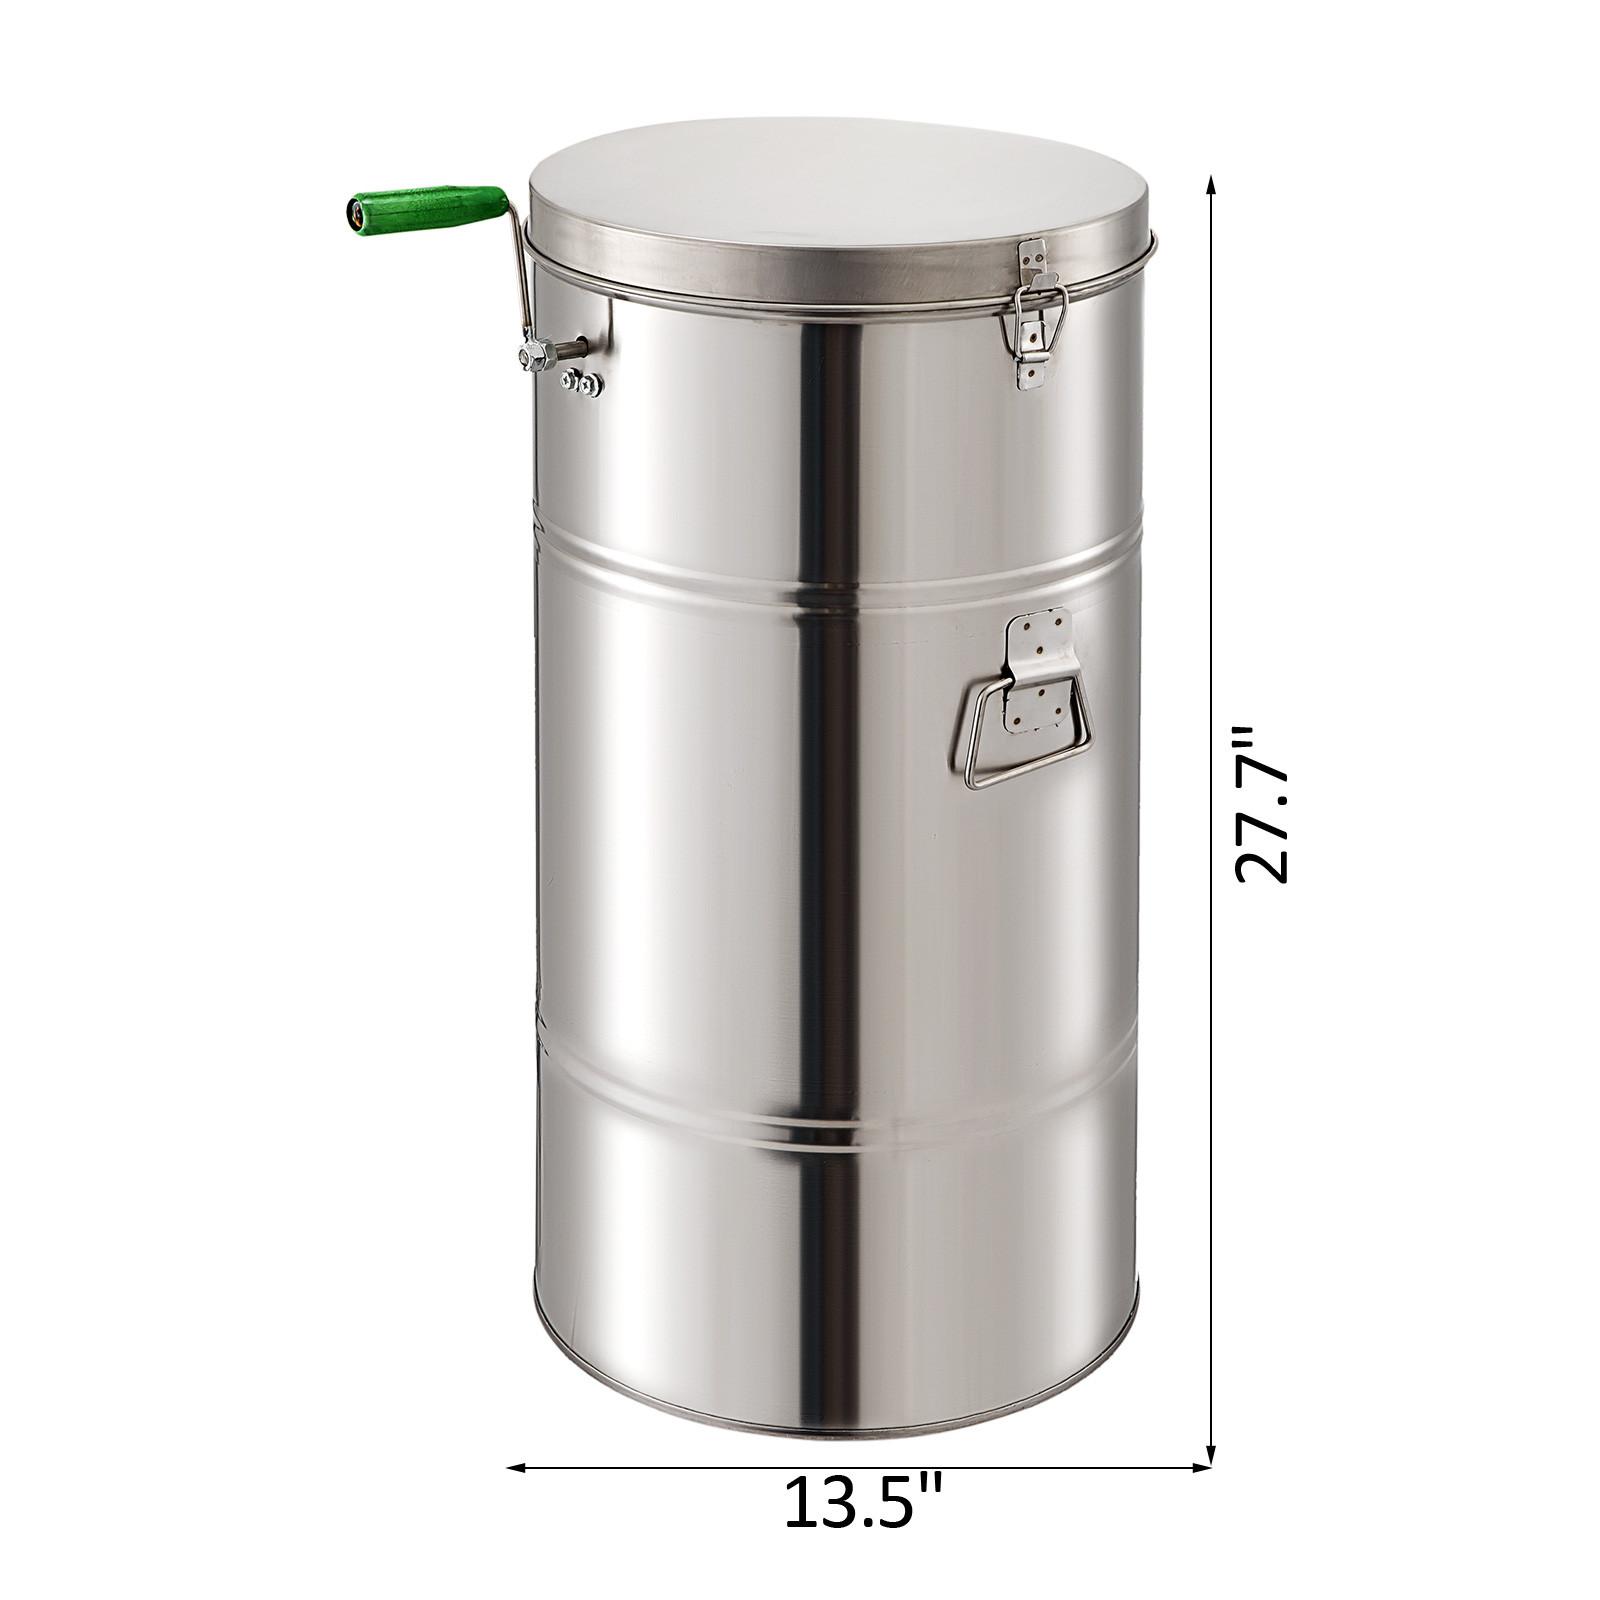 234 234 234 Acero Inoxidable ManualEléctrico Extractor De Miel  Panal Apiculture f3815f